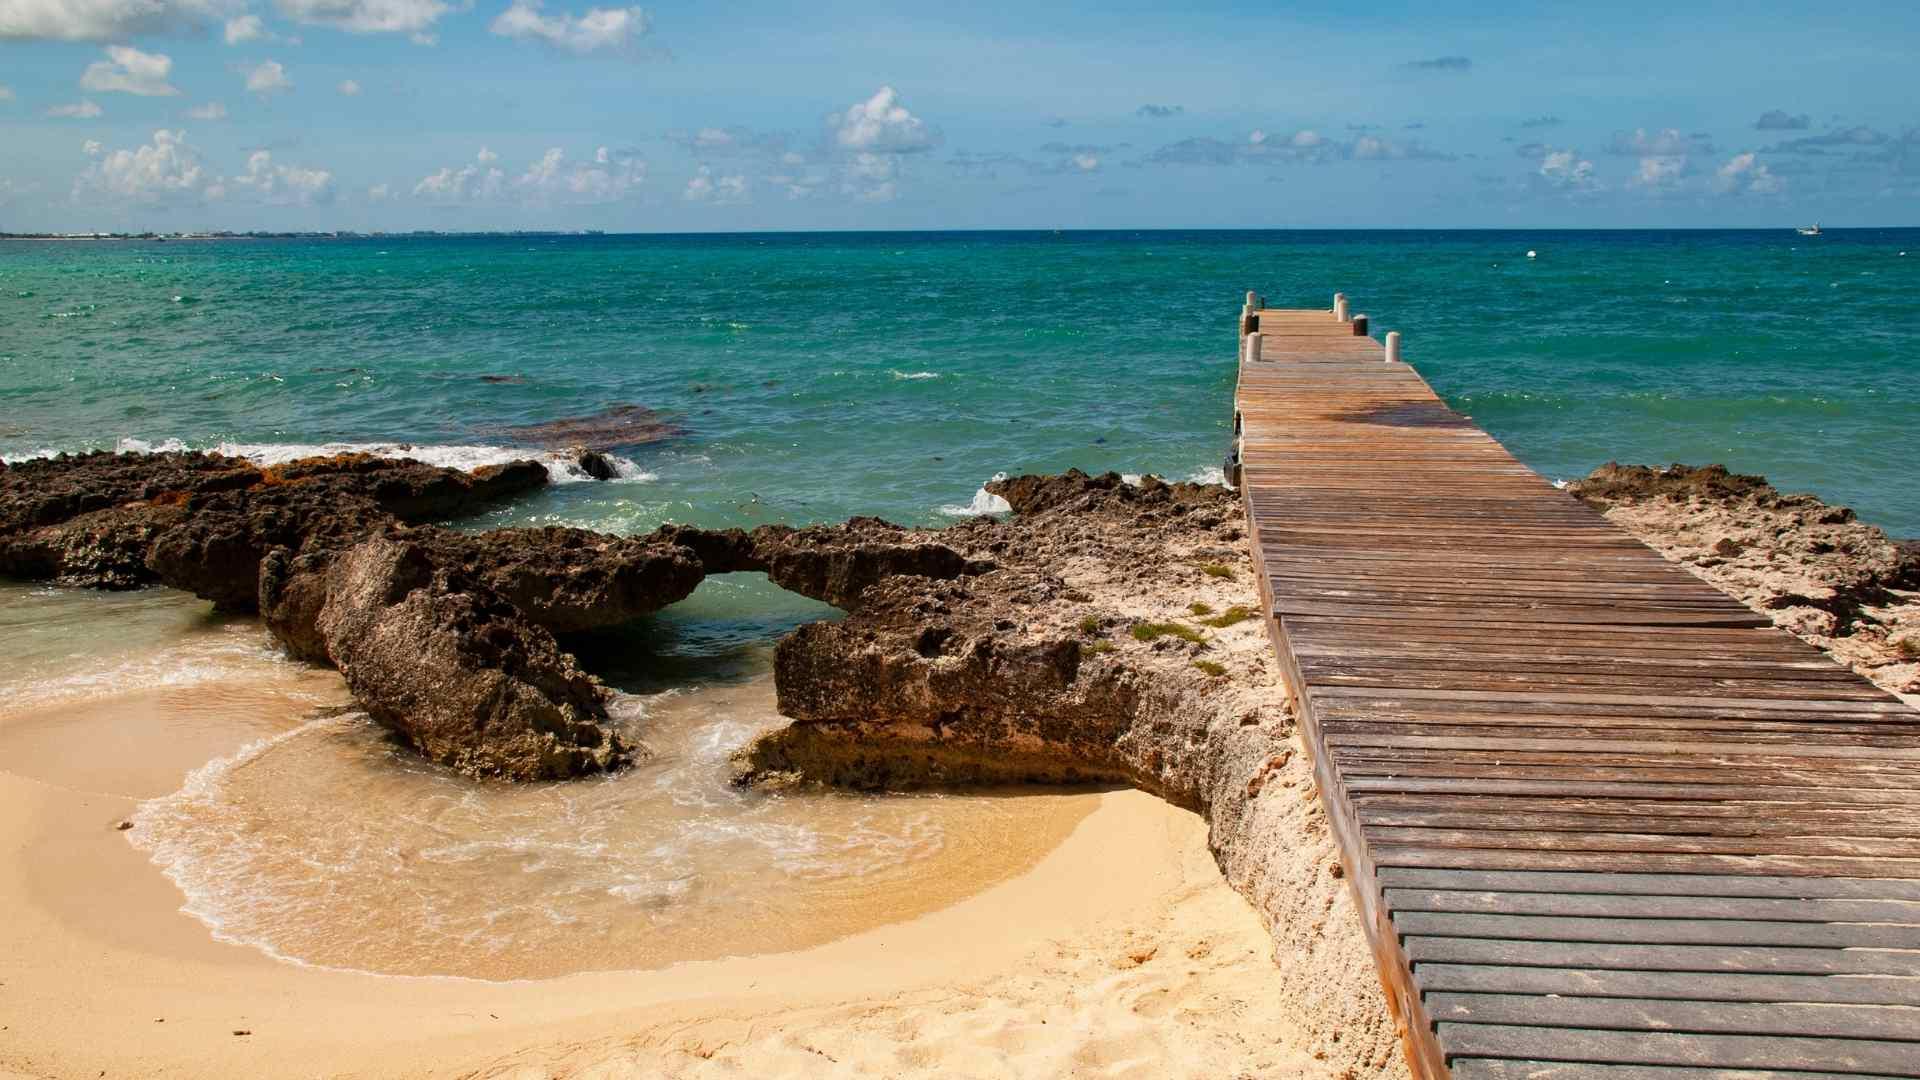 Cayman Islands cruise port